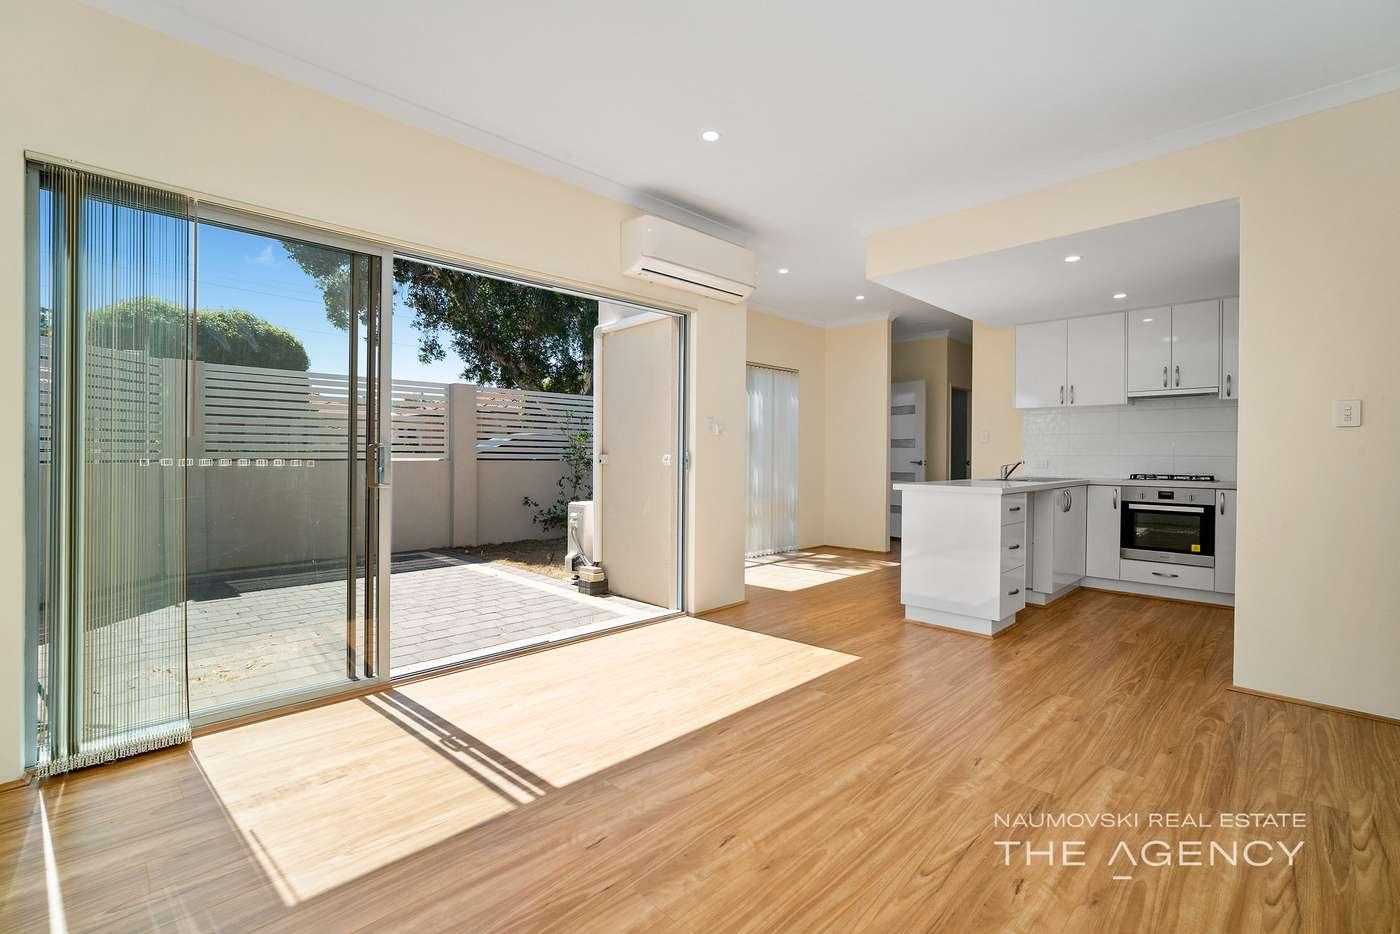 Seventh view of Homely house listing, 1/14 Nollamara Avenue, Nollamara WA 6061